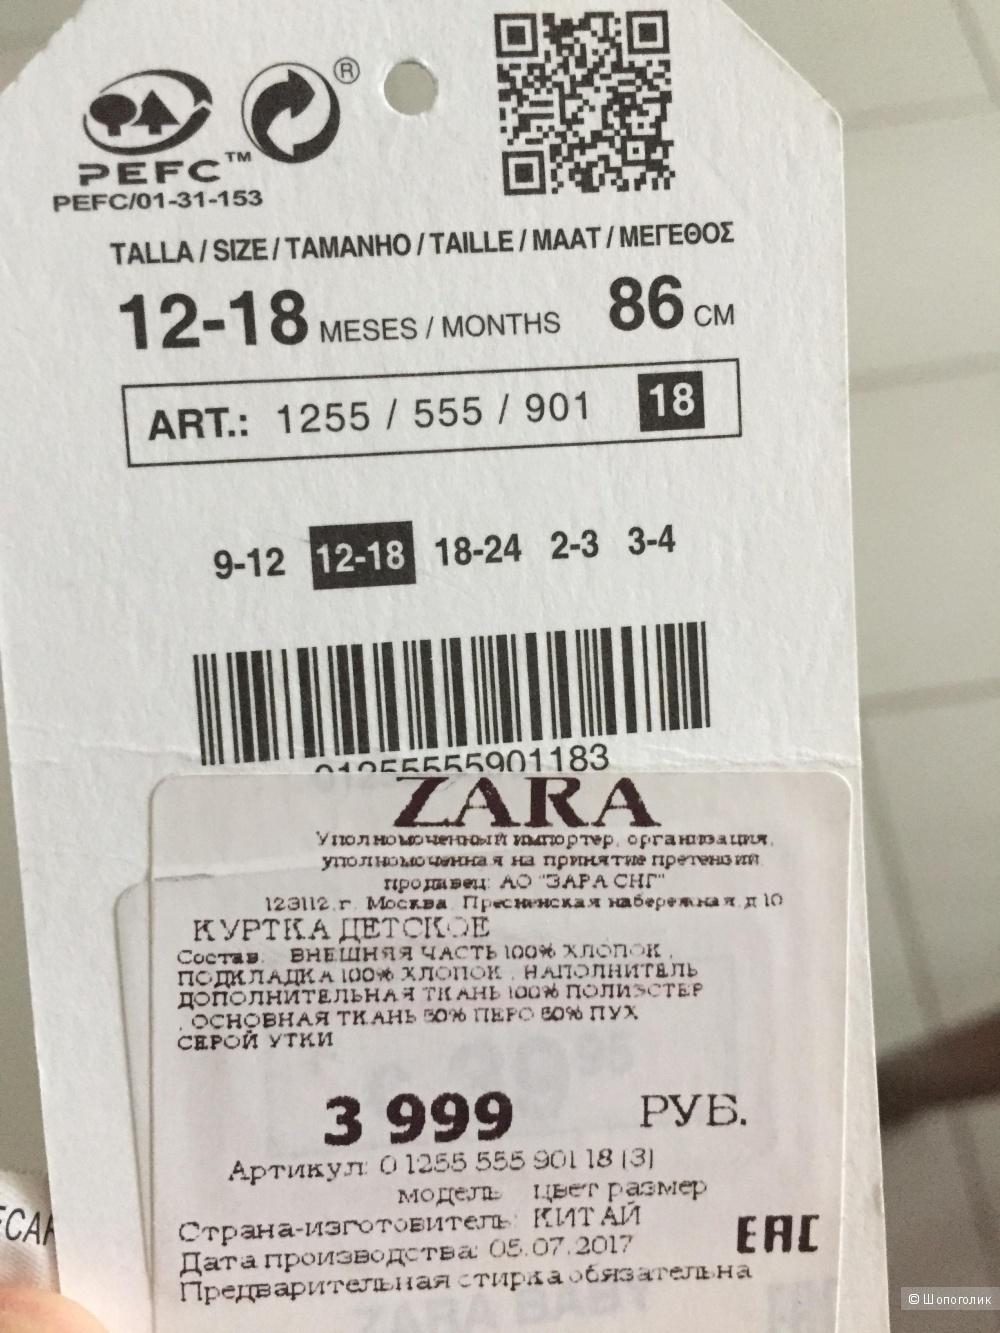 Пуховик Zara, размер 86 см